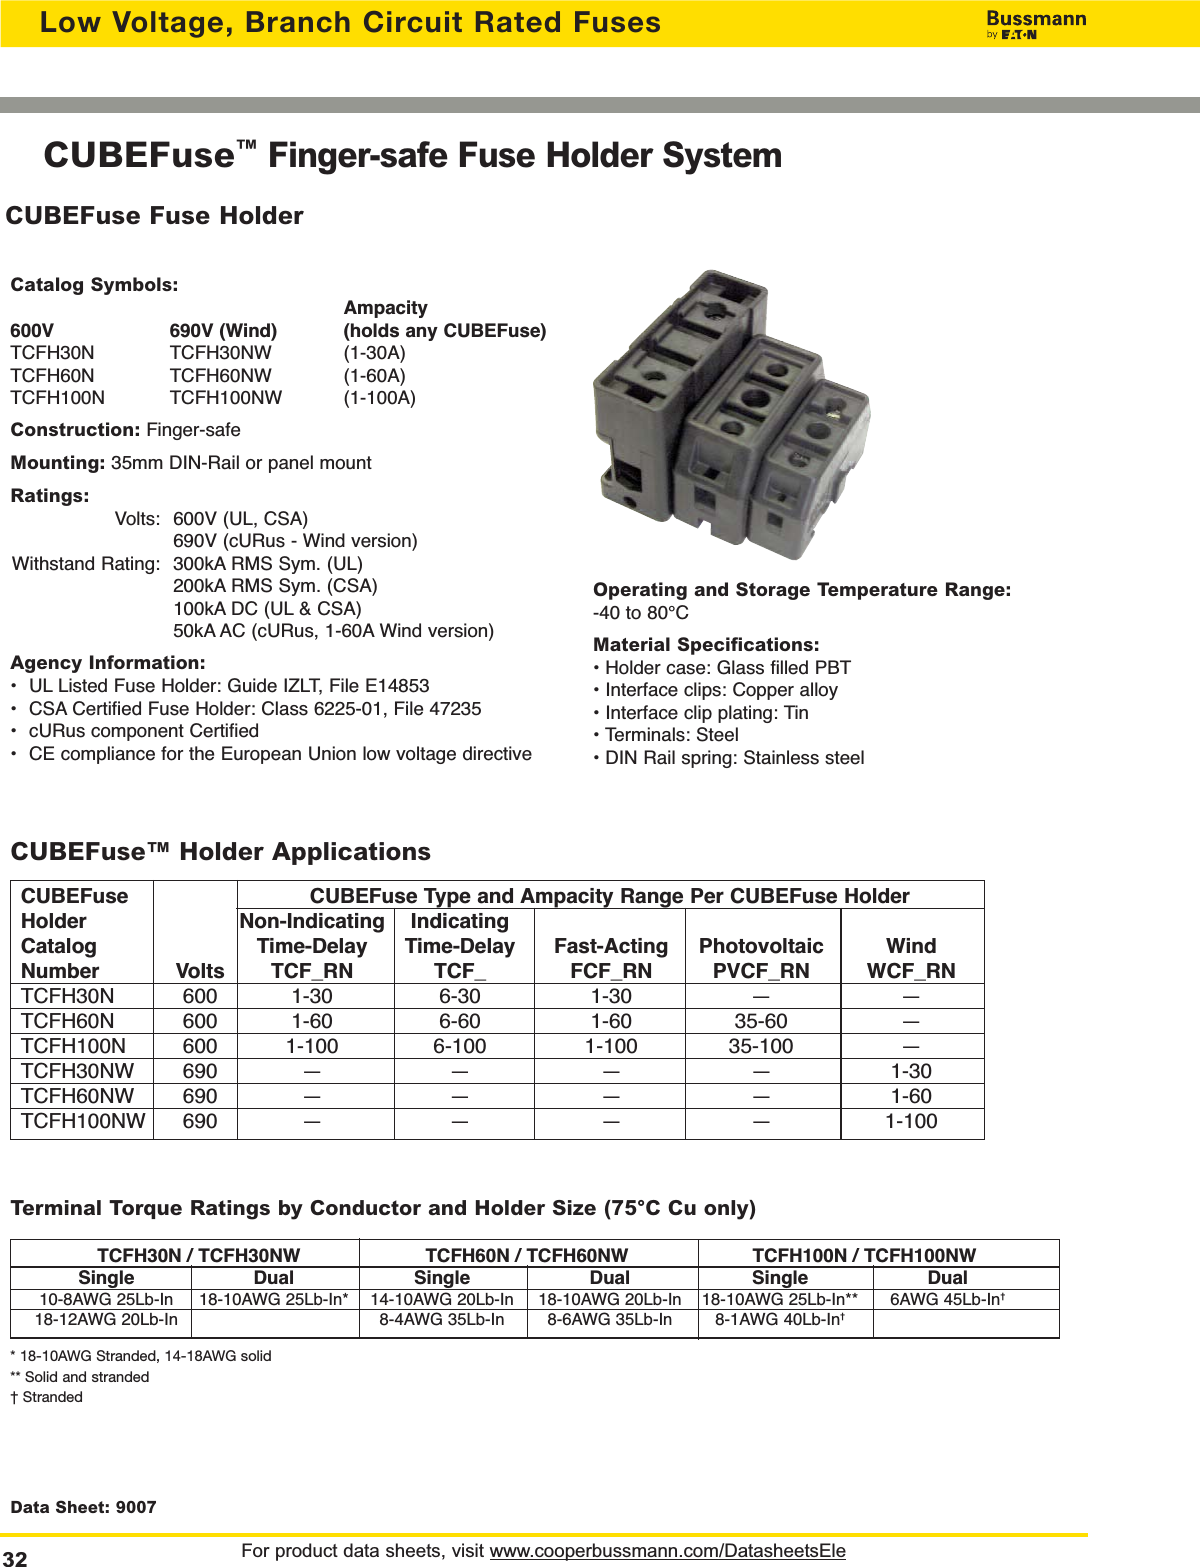 Bussmann HKP Panel Mount 3AG AGC Cartridge Fuse Holder 120V 12V Car Replacement